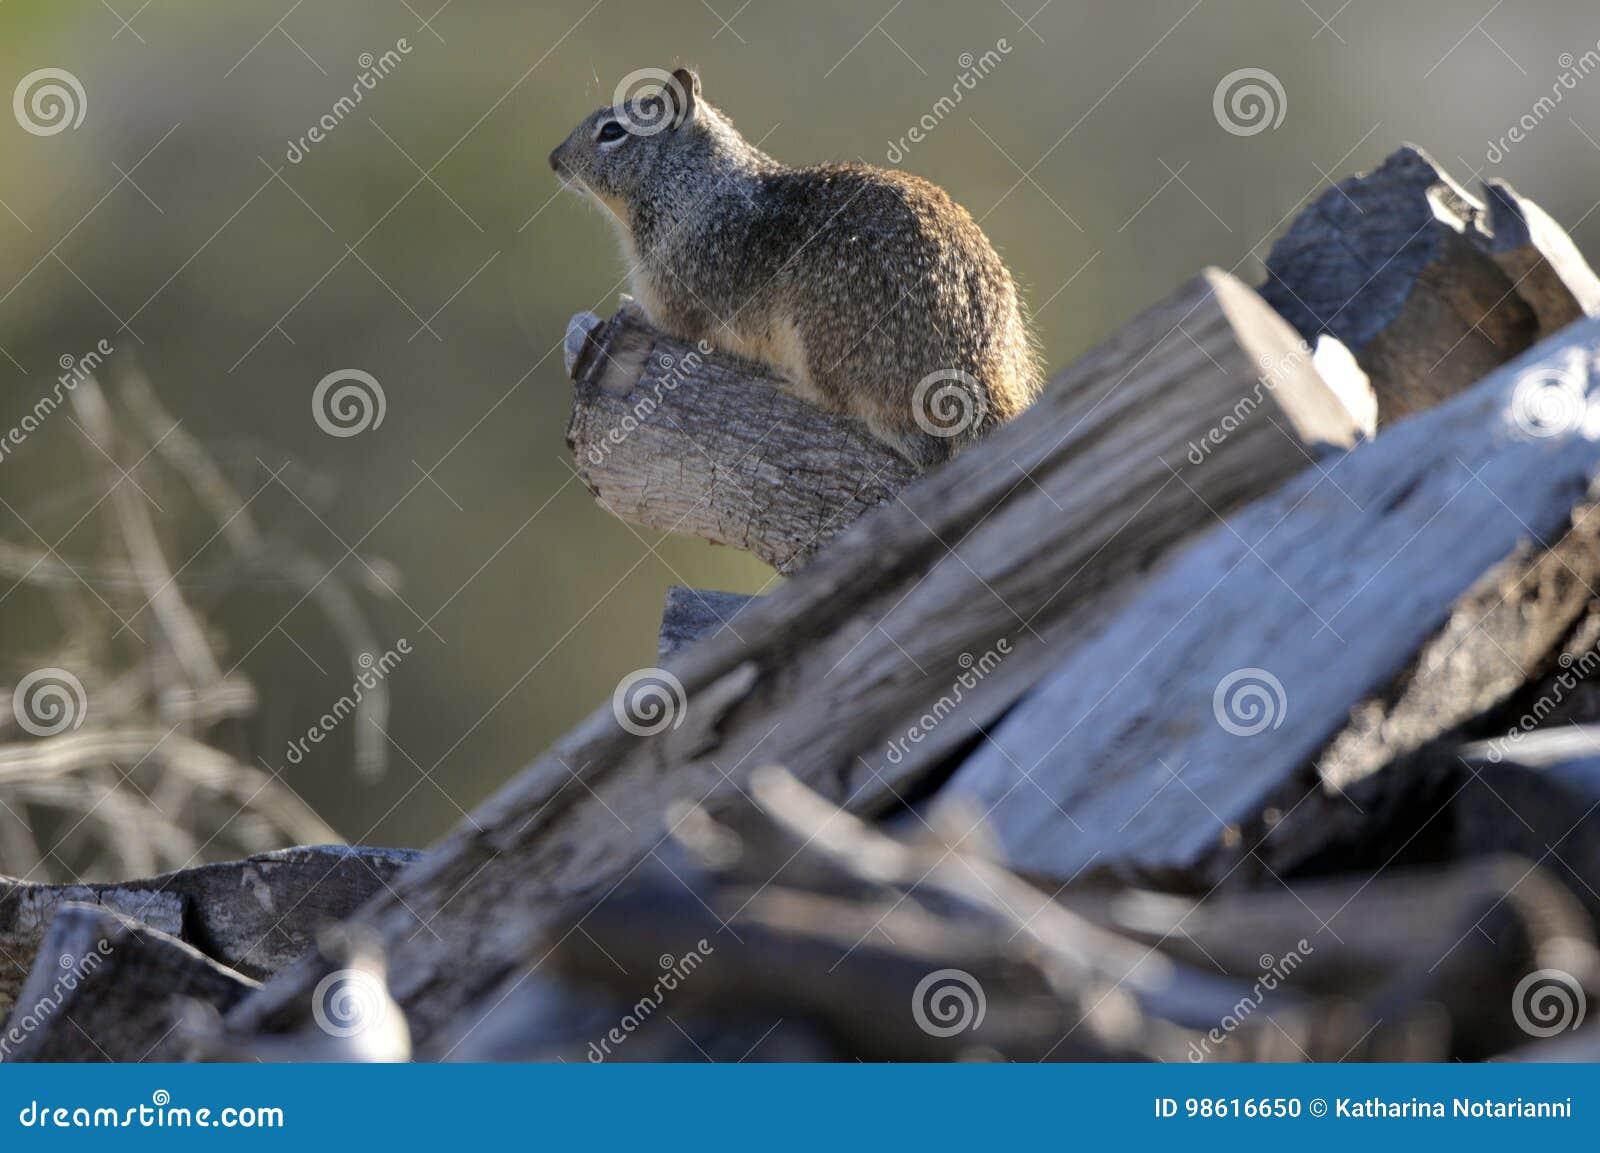 California ground squirrel Otospermophilus beecheyi Close Up